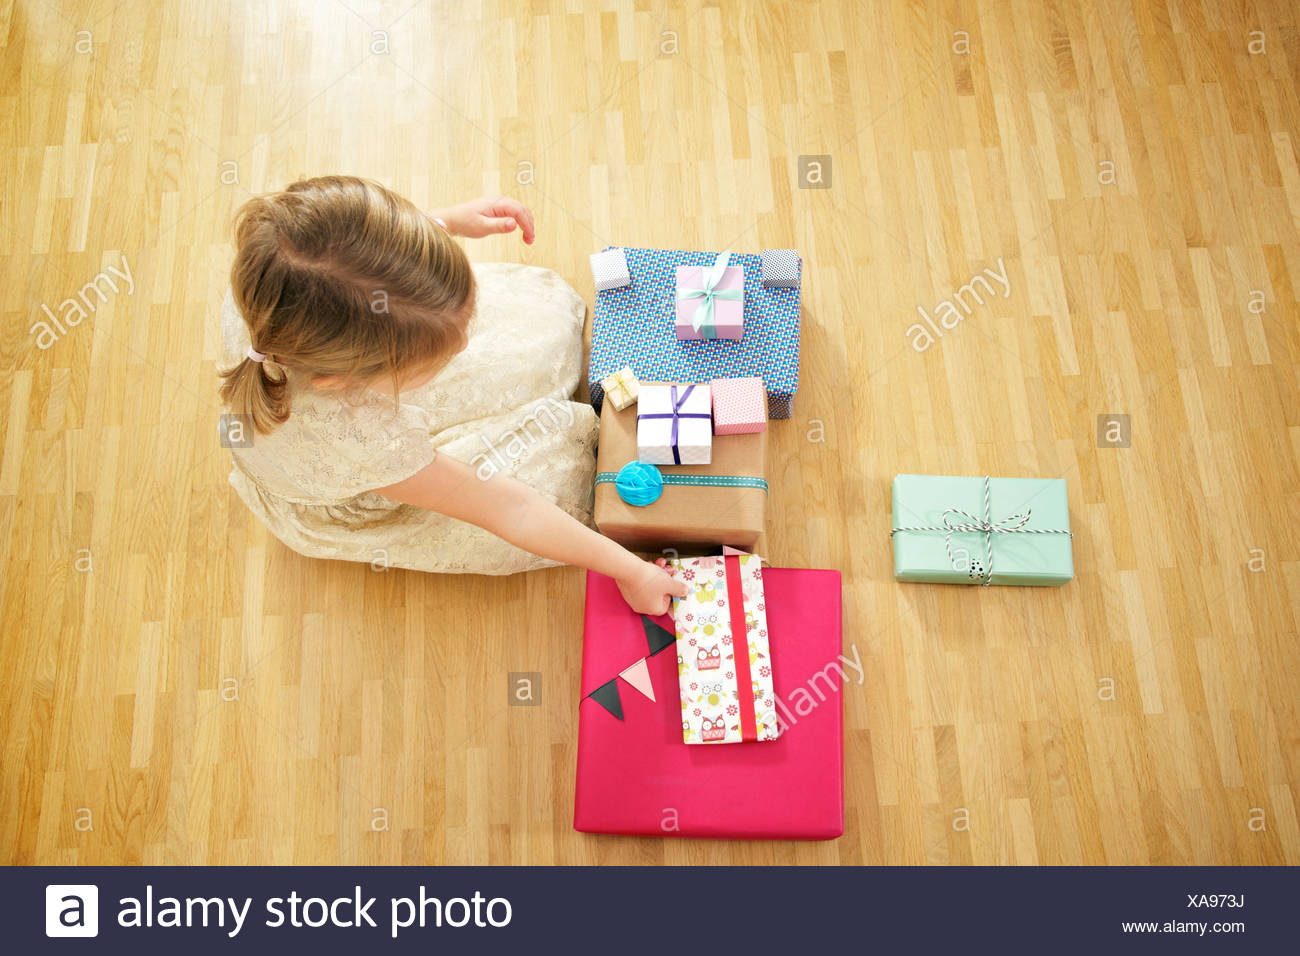 Fille sur anniversaire unwrapping gift boxes, Munich, Bavière, Allemagne Photo Stock